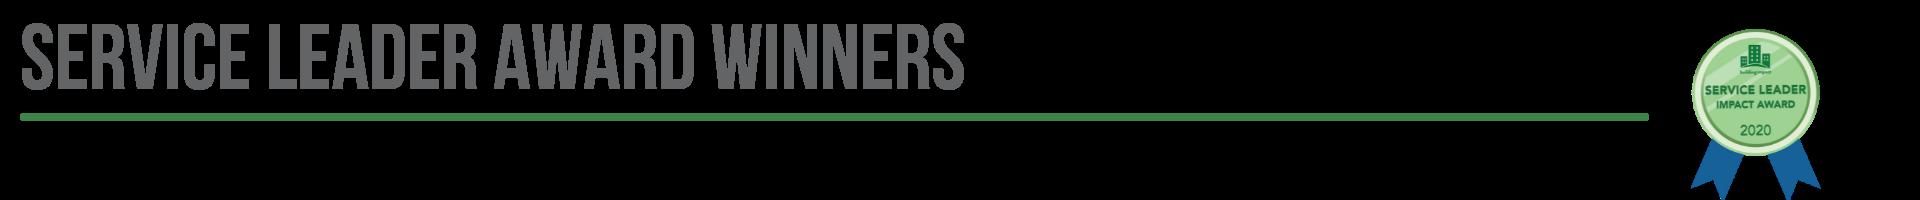 Service Leader Award Winners